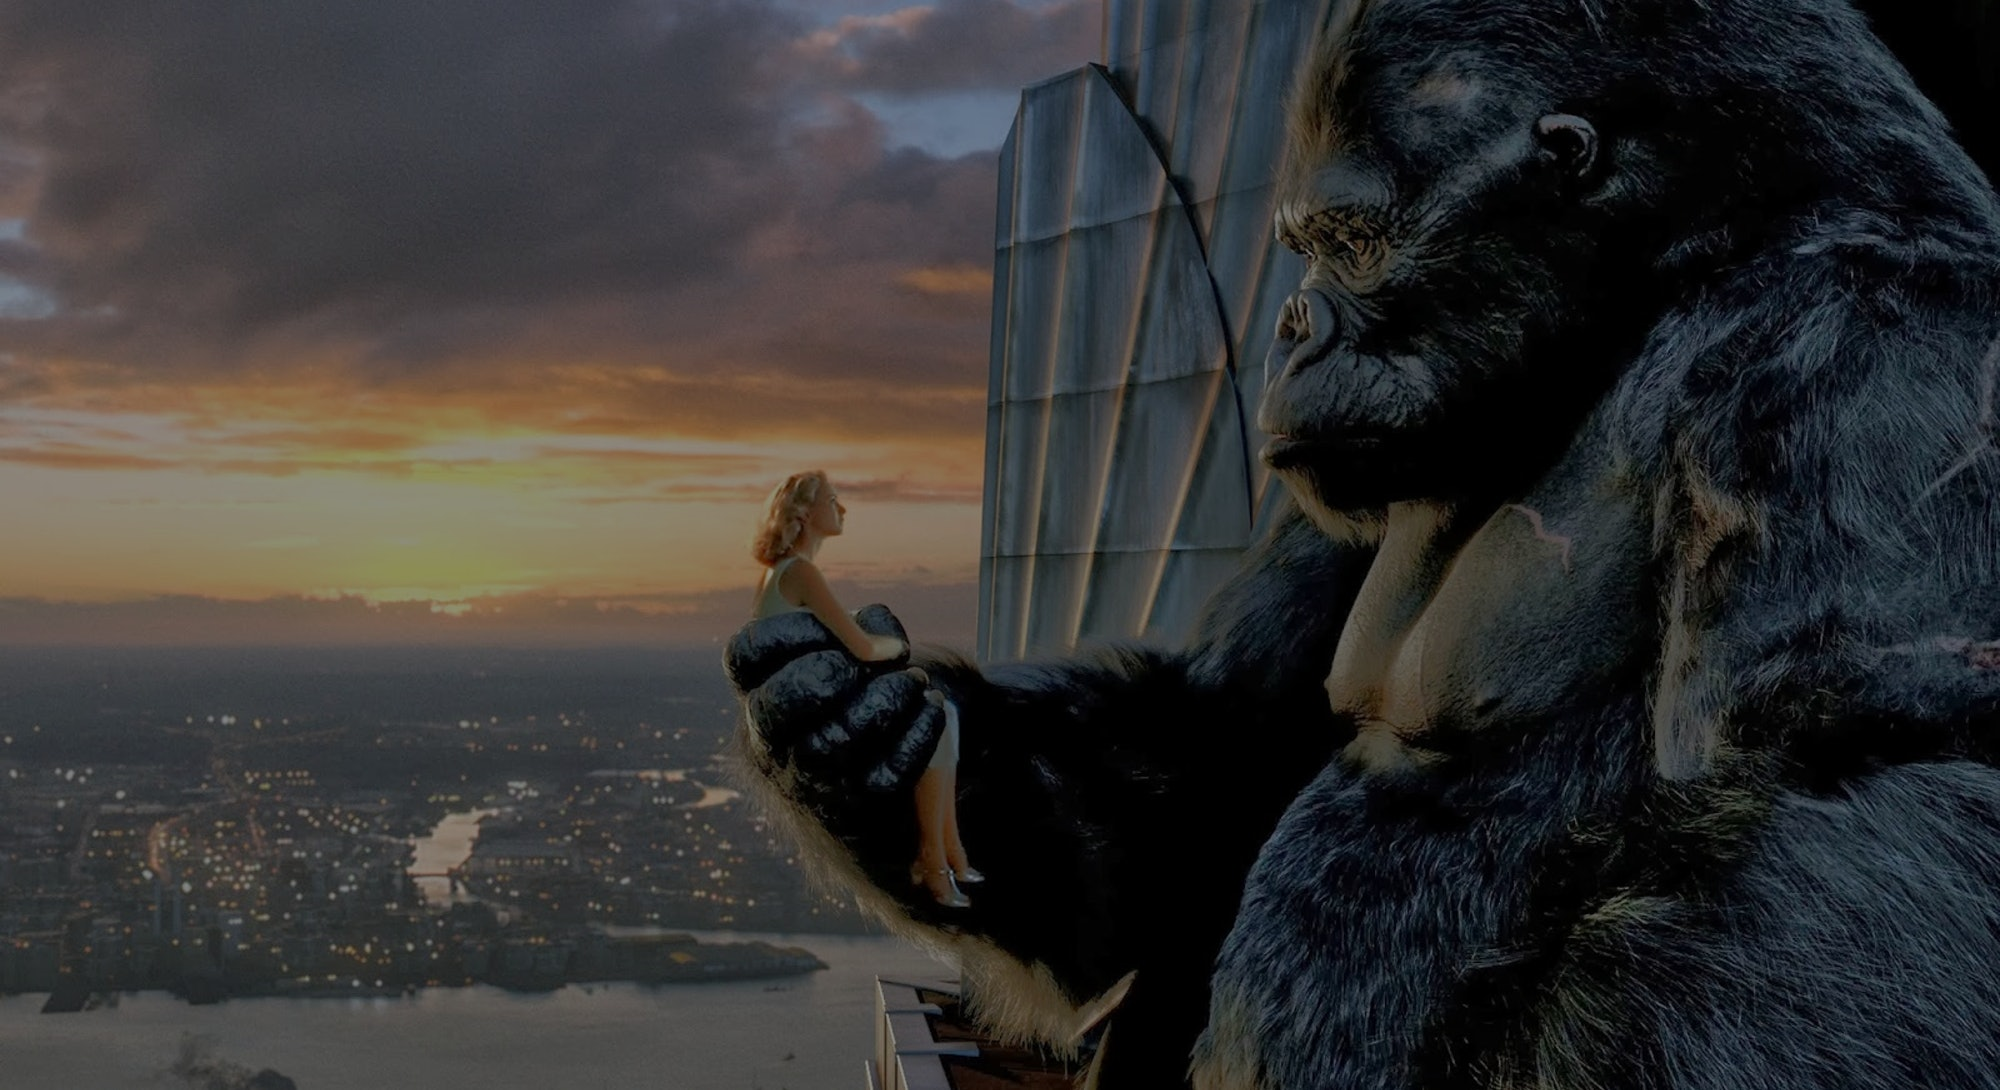 still image of King Kong holding Naomi Watts from 2005 movie